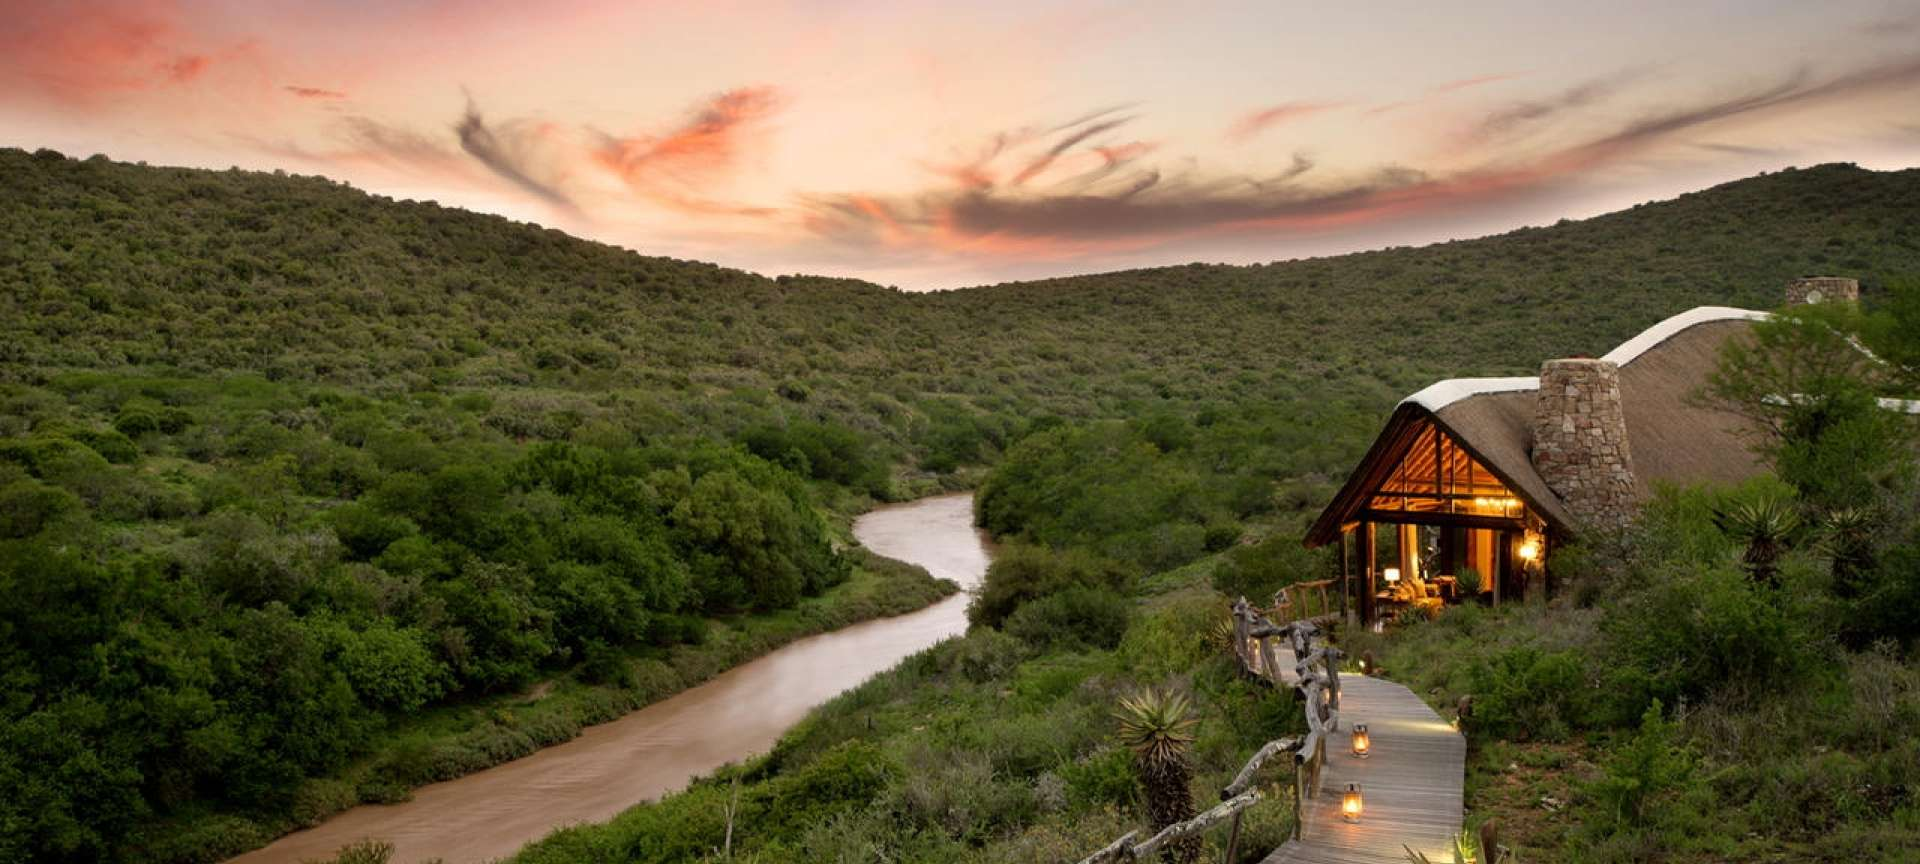 Eastern Cape - Africa Wildlife Safaris